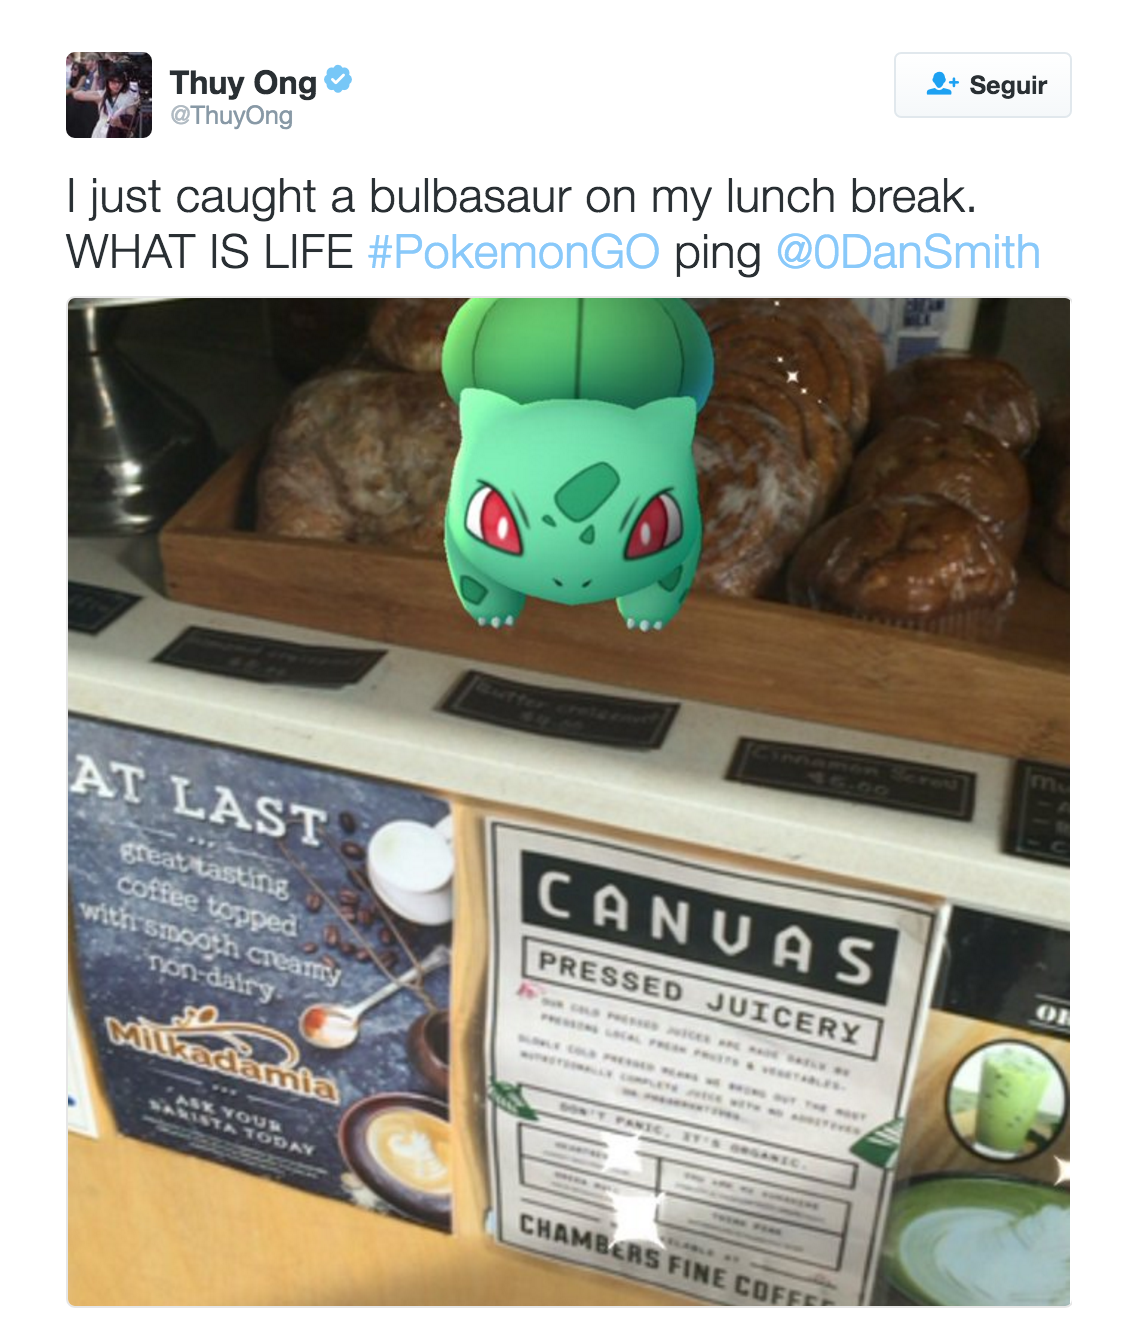 pokemon-go-se-ha-aduenado-de-la-vida-de-millones-de-personas 02